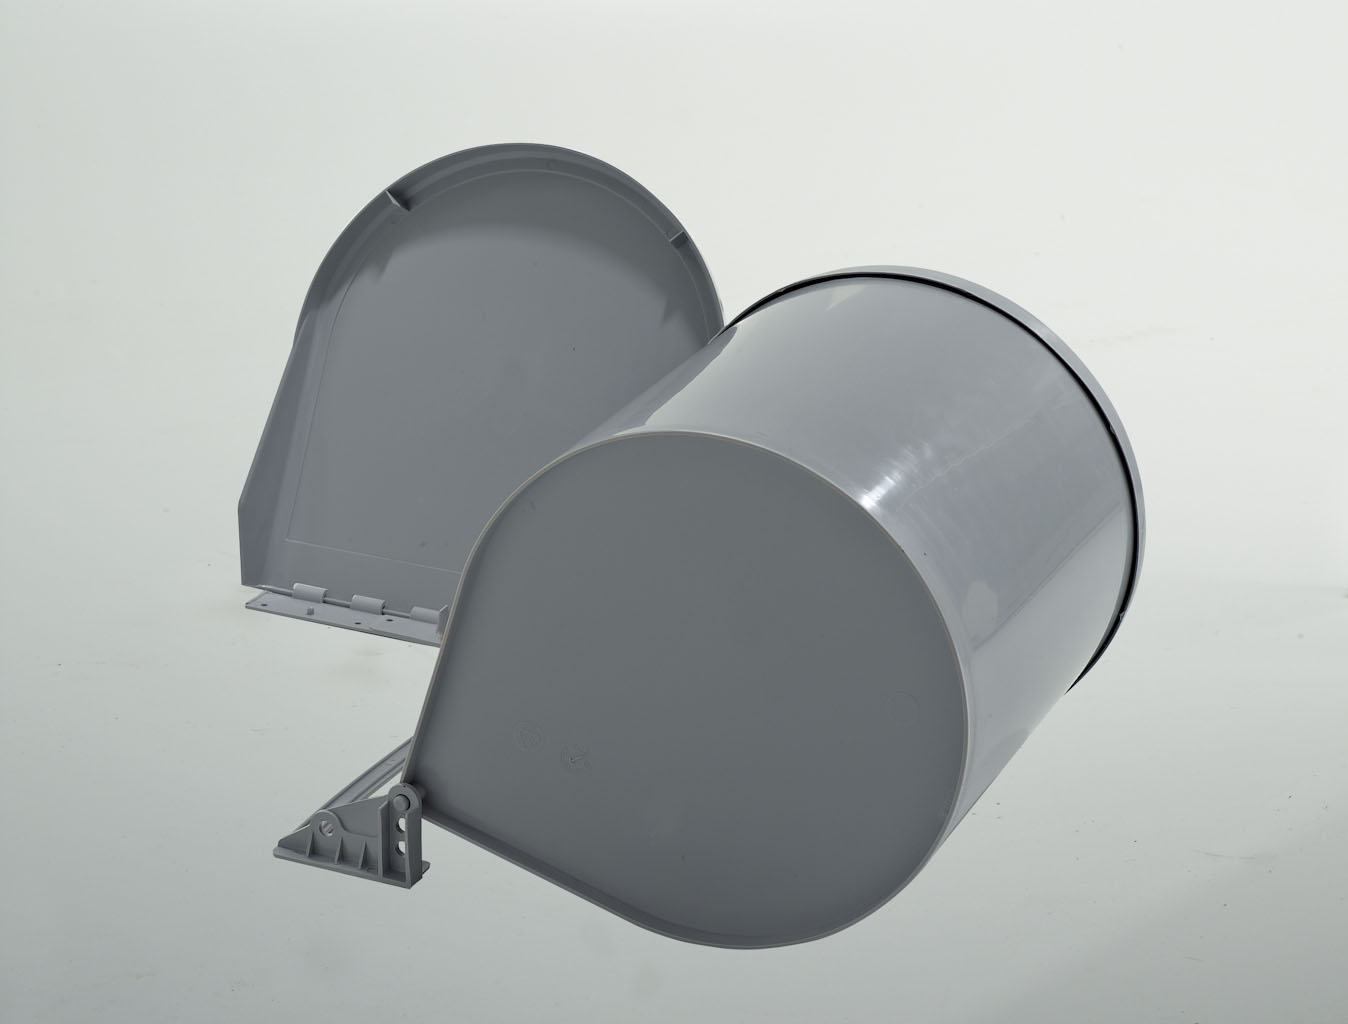 Ведро для мусора RING 10л автомат. открывание (265x320мм) на секцию от 400мм, пластик